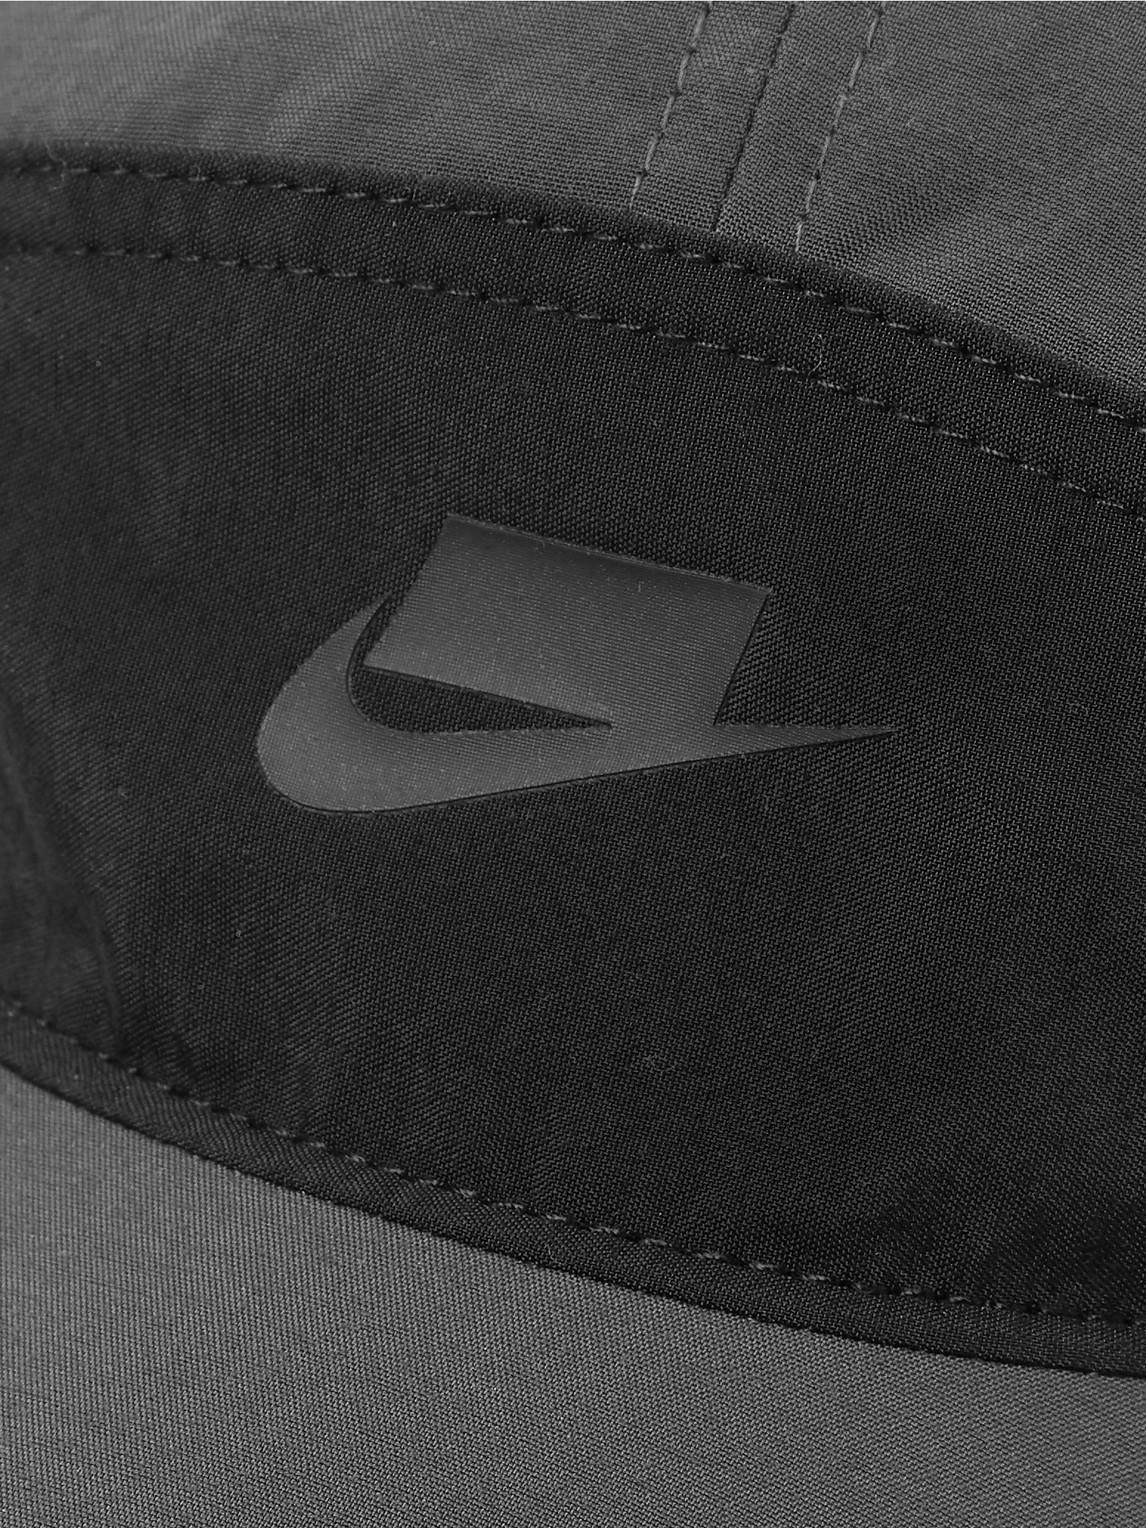 Nike Accessories SPORTSWEAR TAILWIND SHELL AND MESH BASEBALL CAP